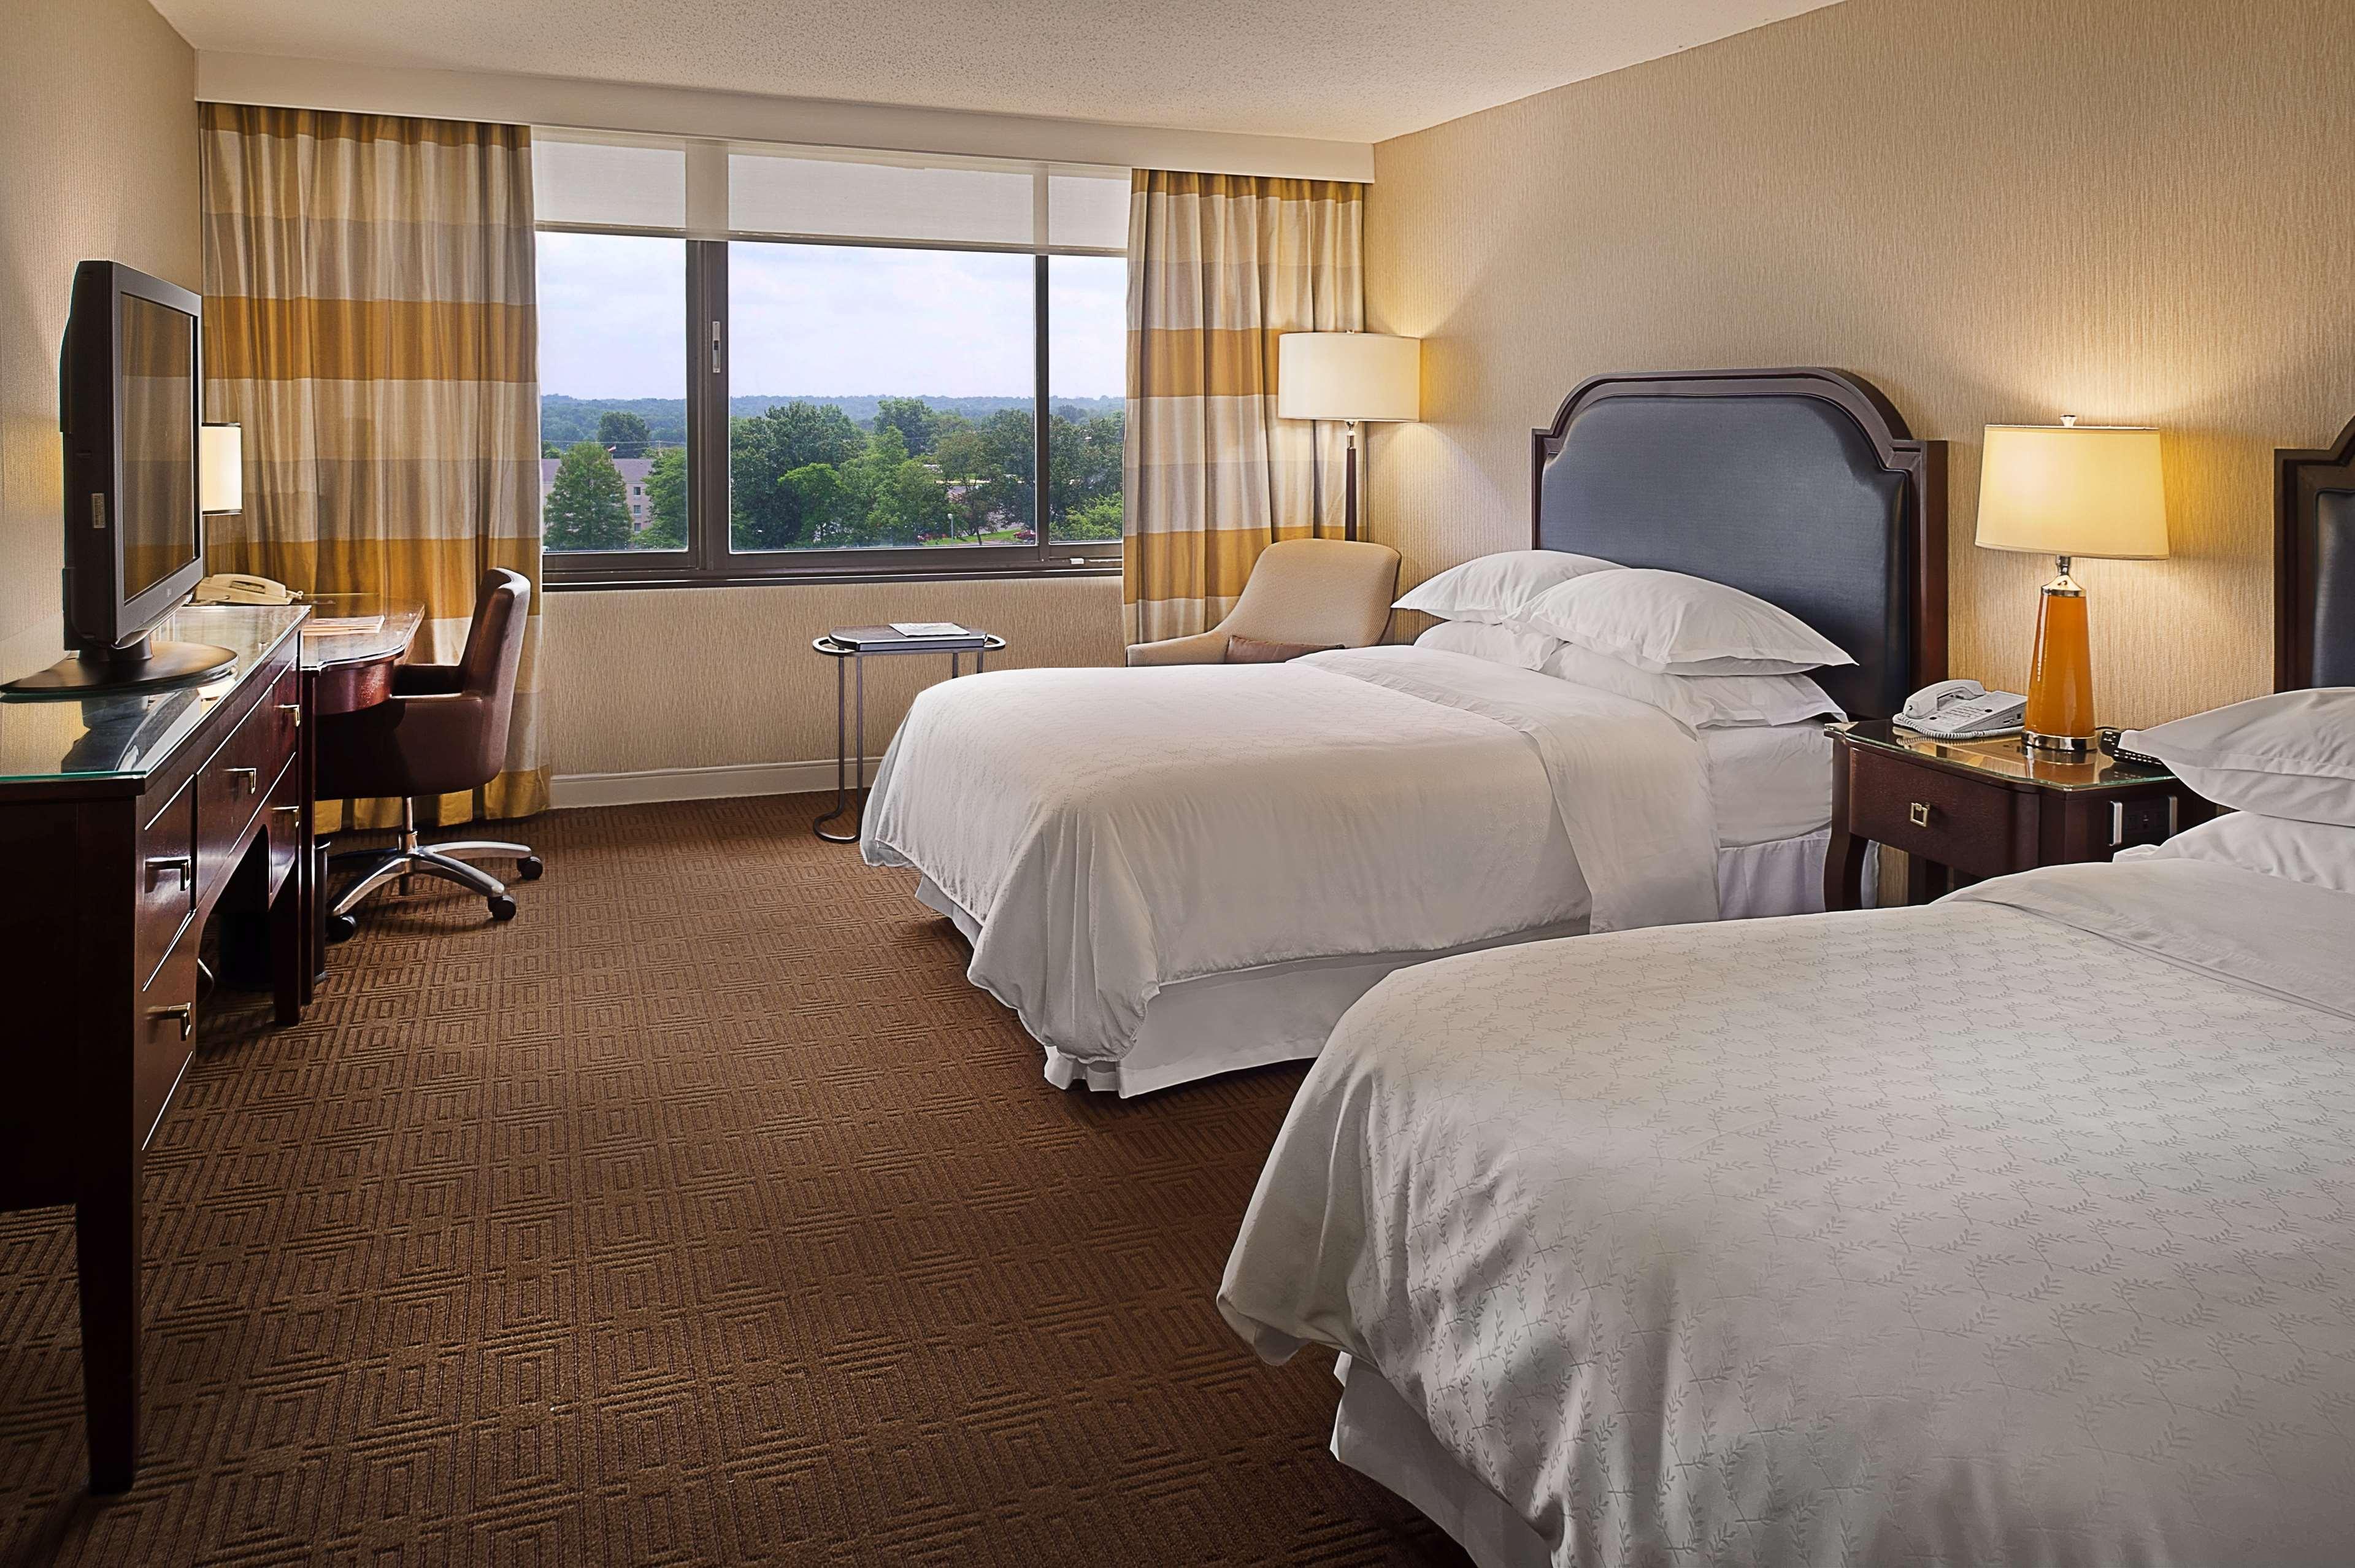 Sheraton Westport Plaza Hotel St. Louis image 22